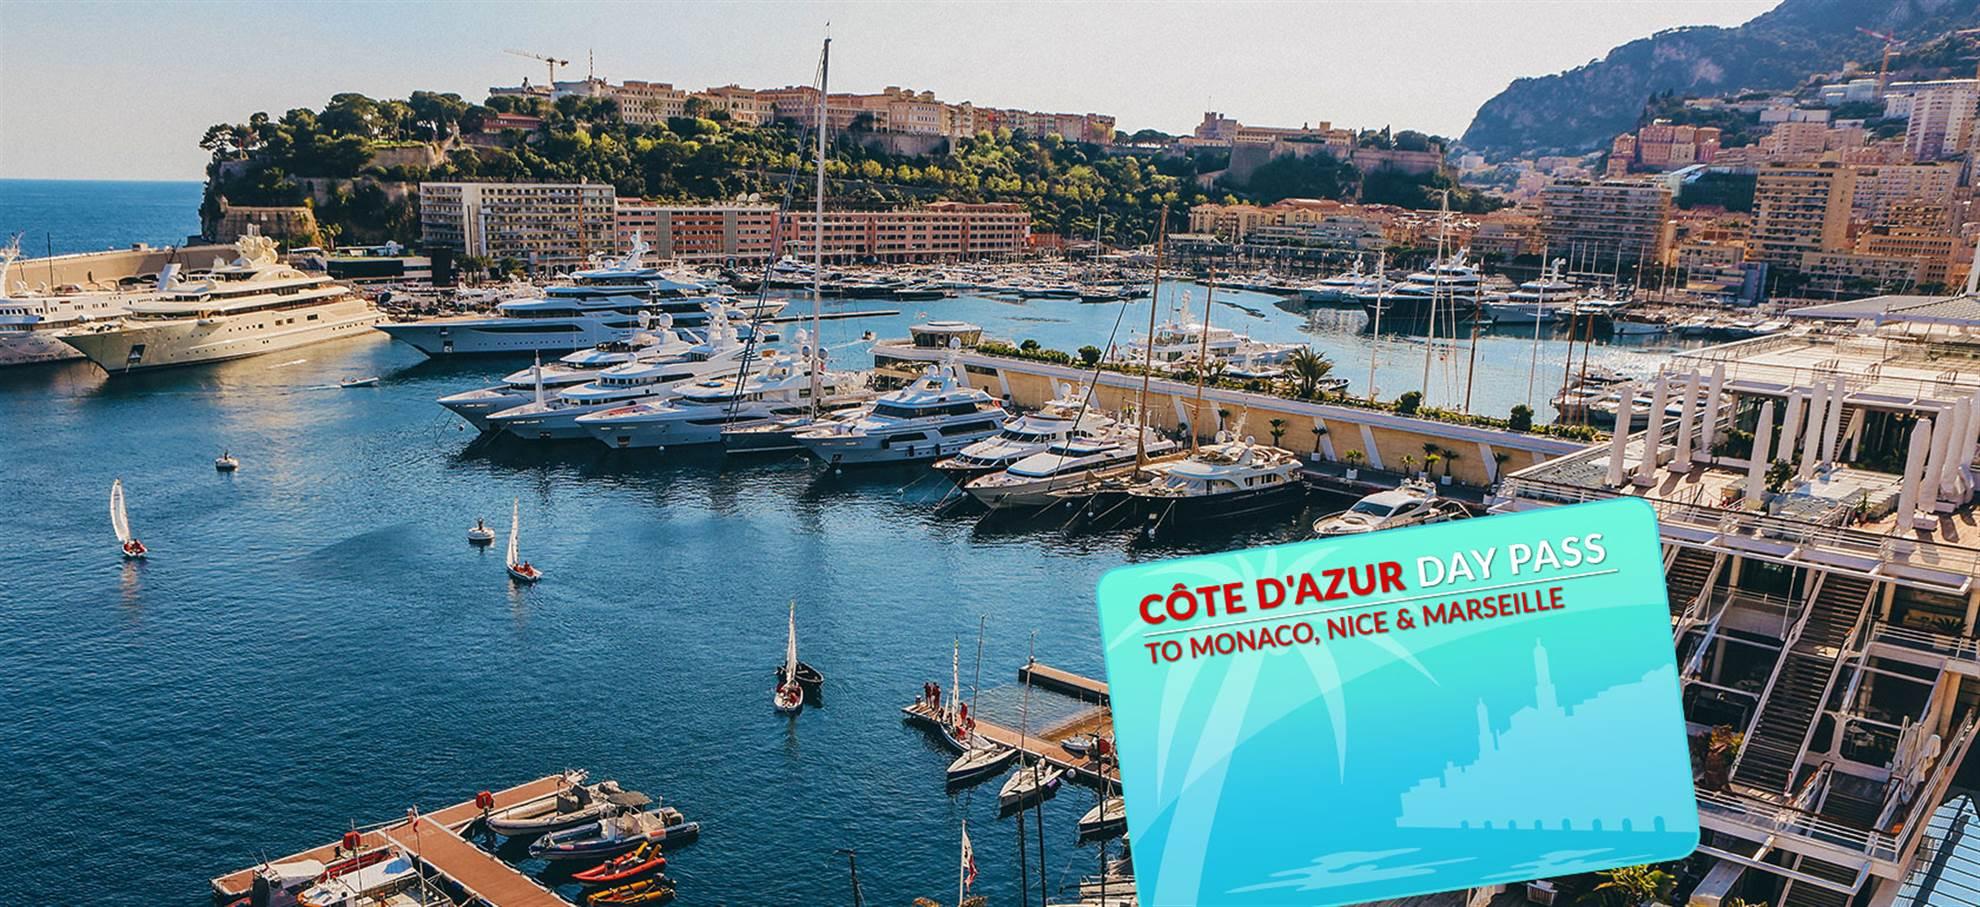 Côte d'Azur Day Pass para Marsella / Niza / Mónaco